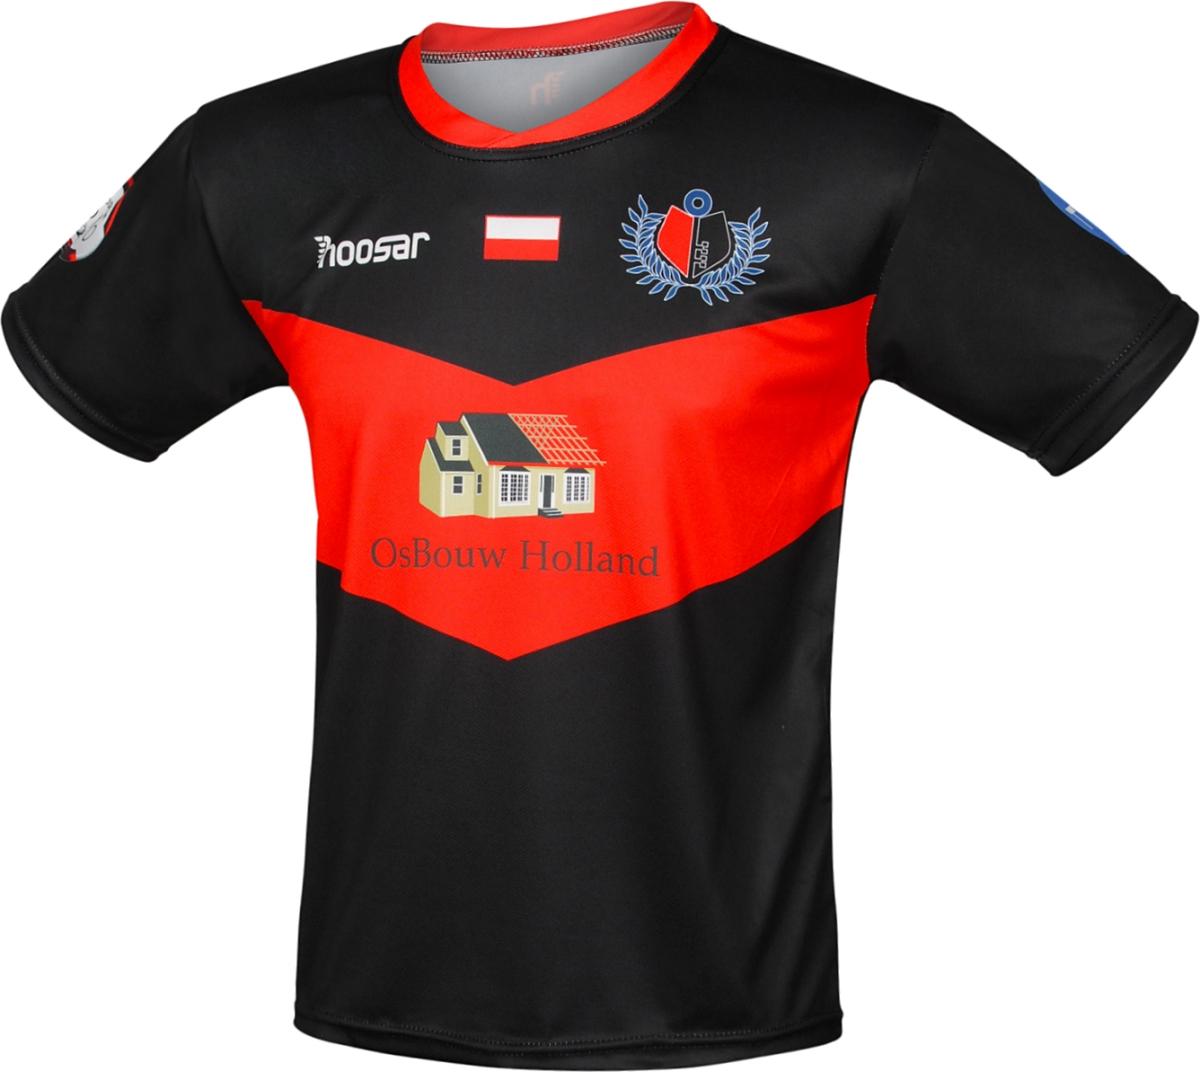 78293ebd9dff00 Koszulki piłkarskie - Faneo.net